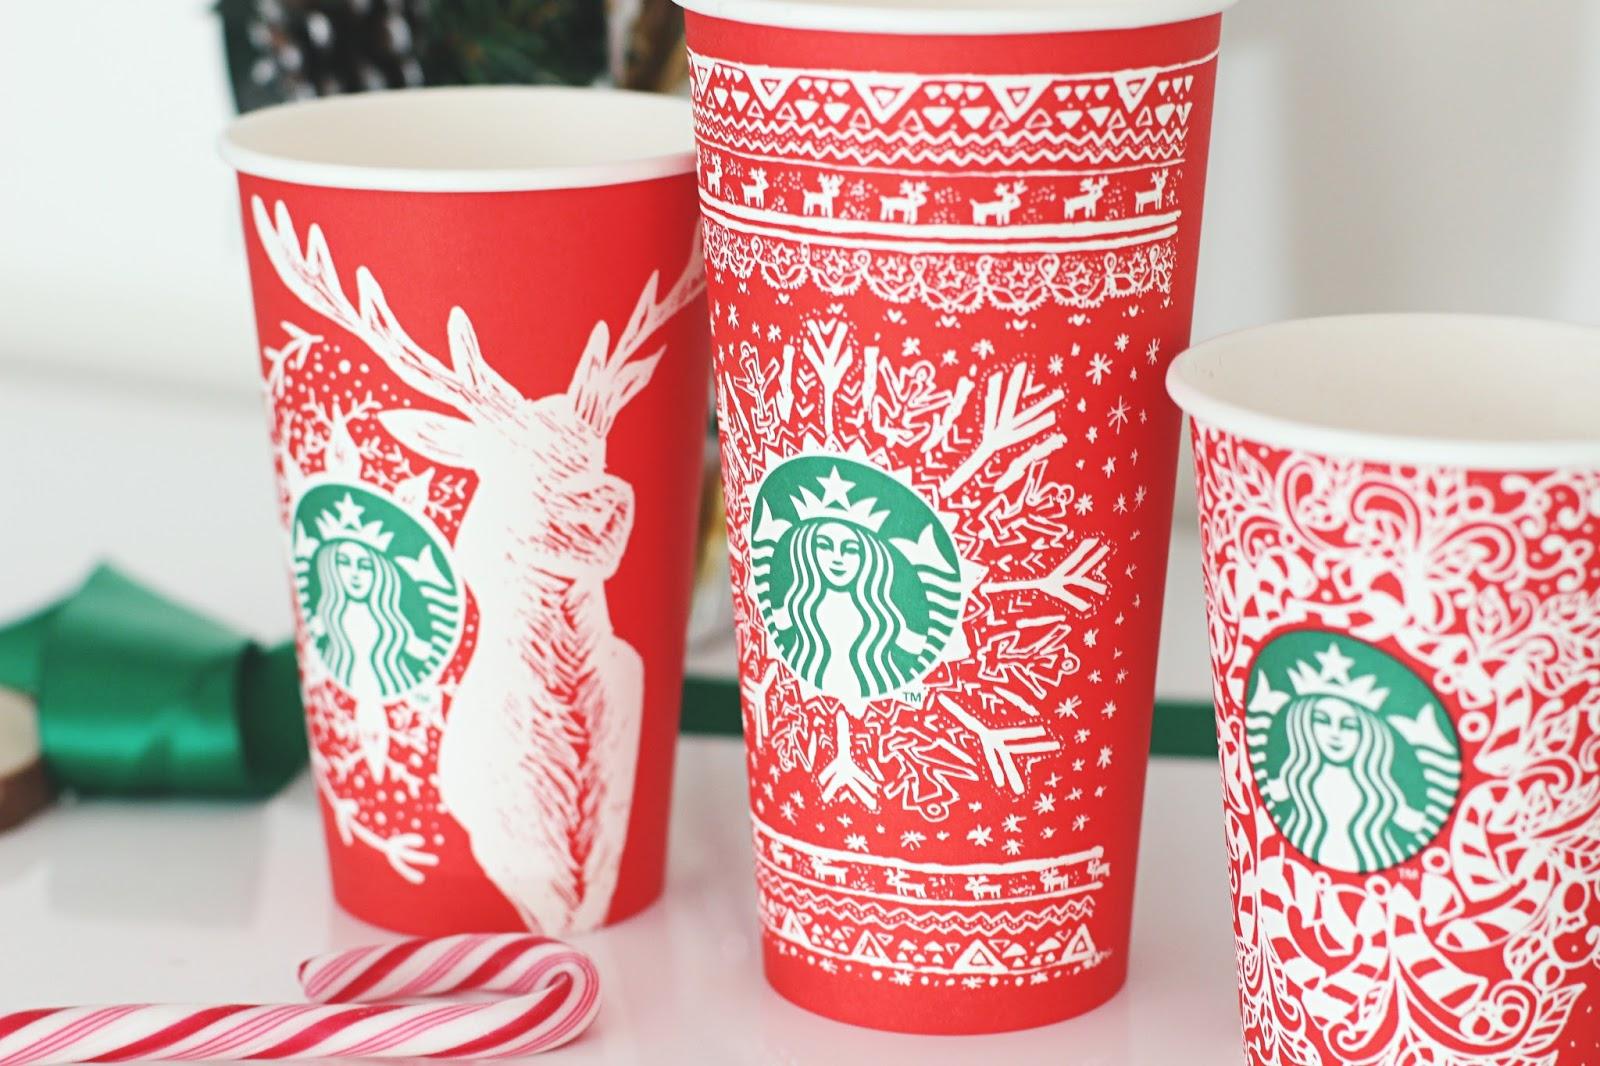 Starbucks Redcups